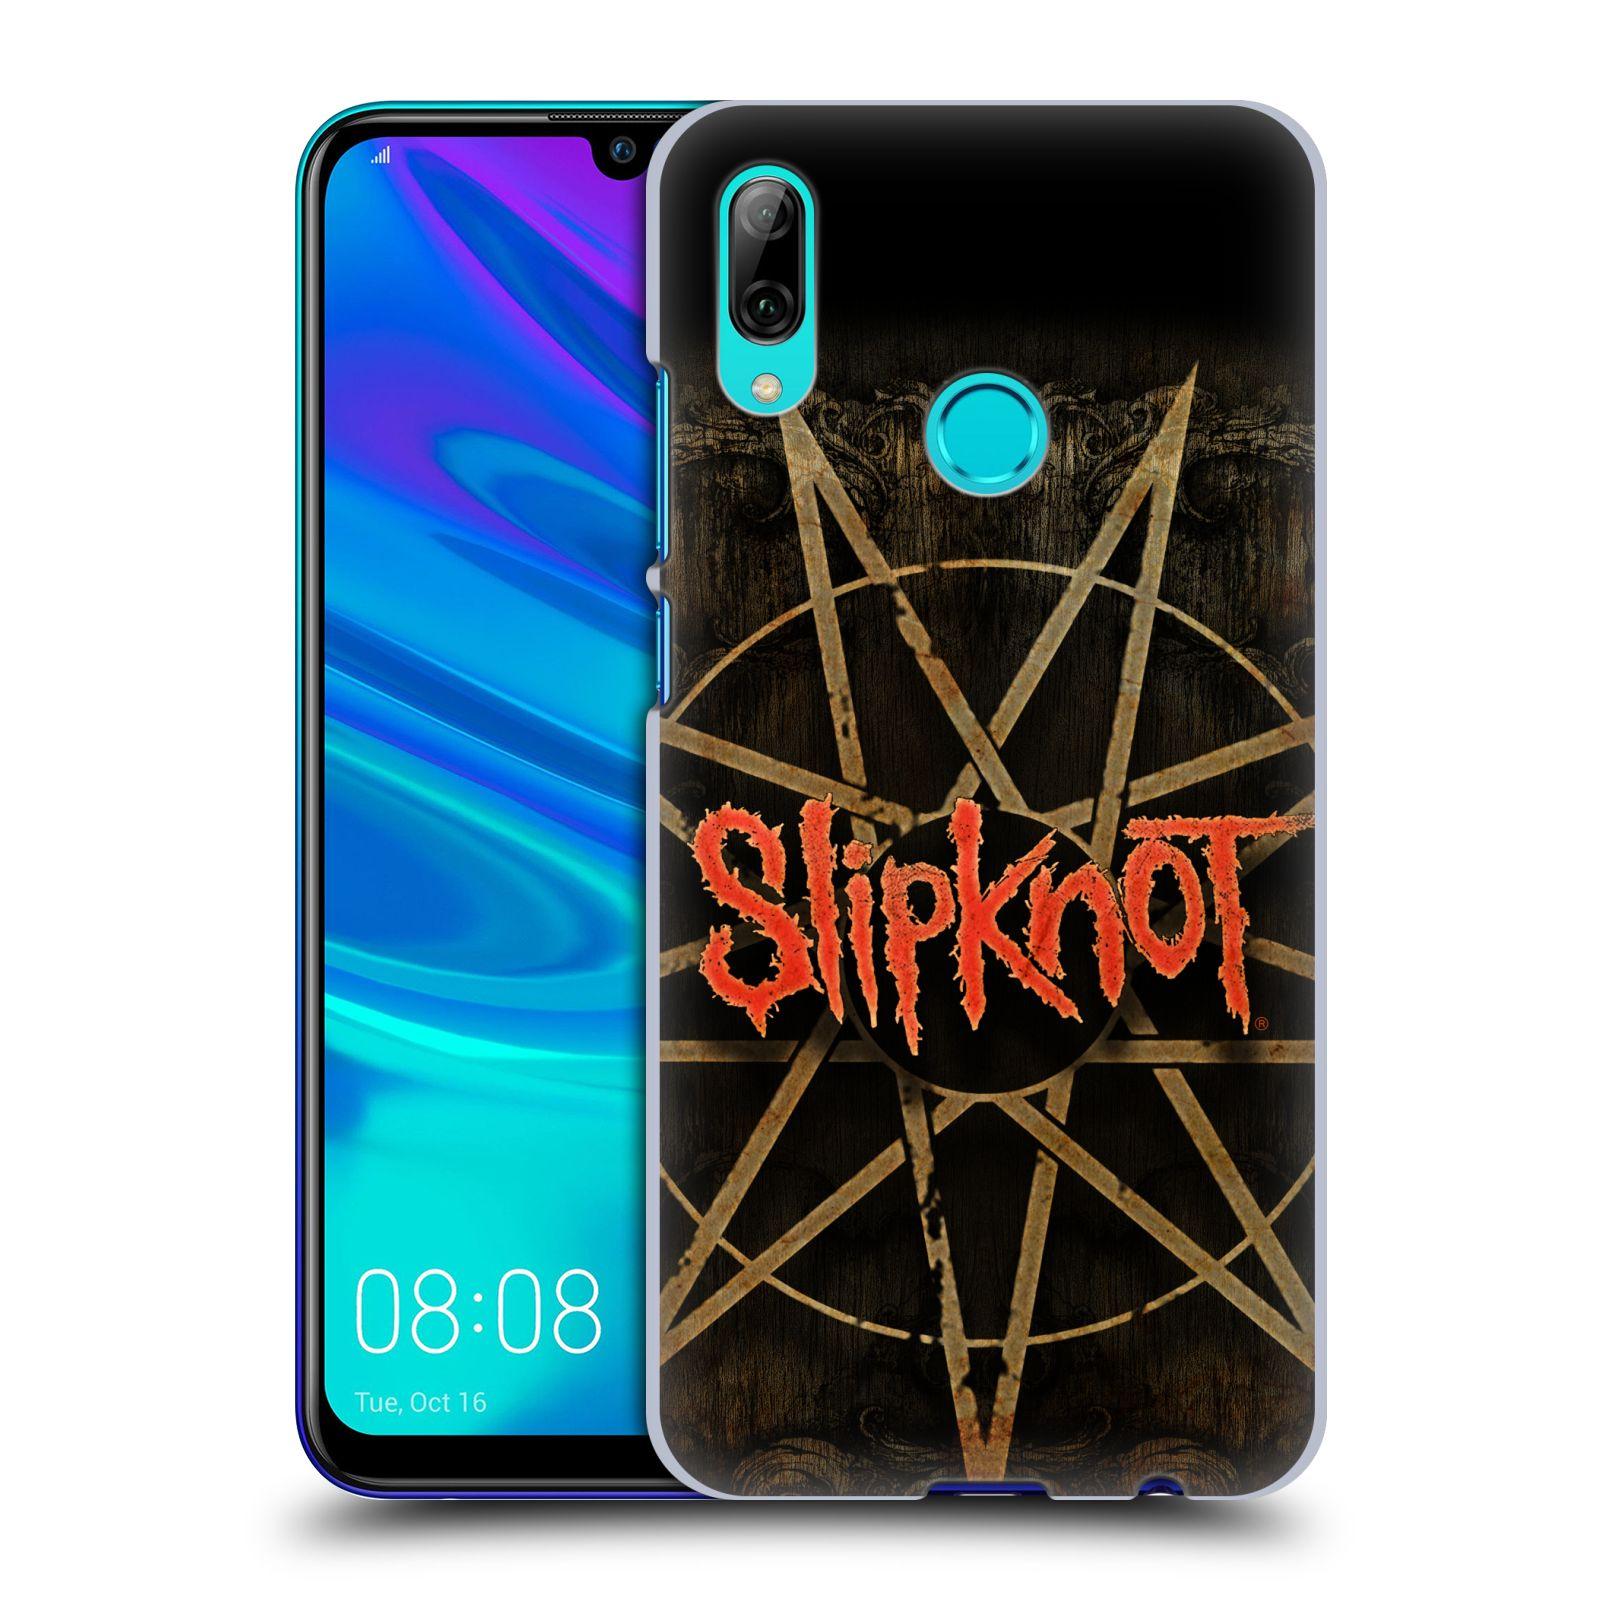 Plastové pouzdro na mobil Honor 10 Lite - Head Case - Slipknot - Znak